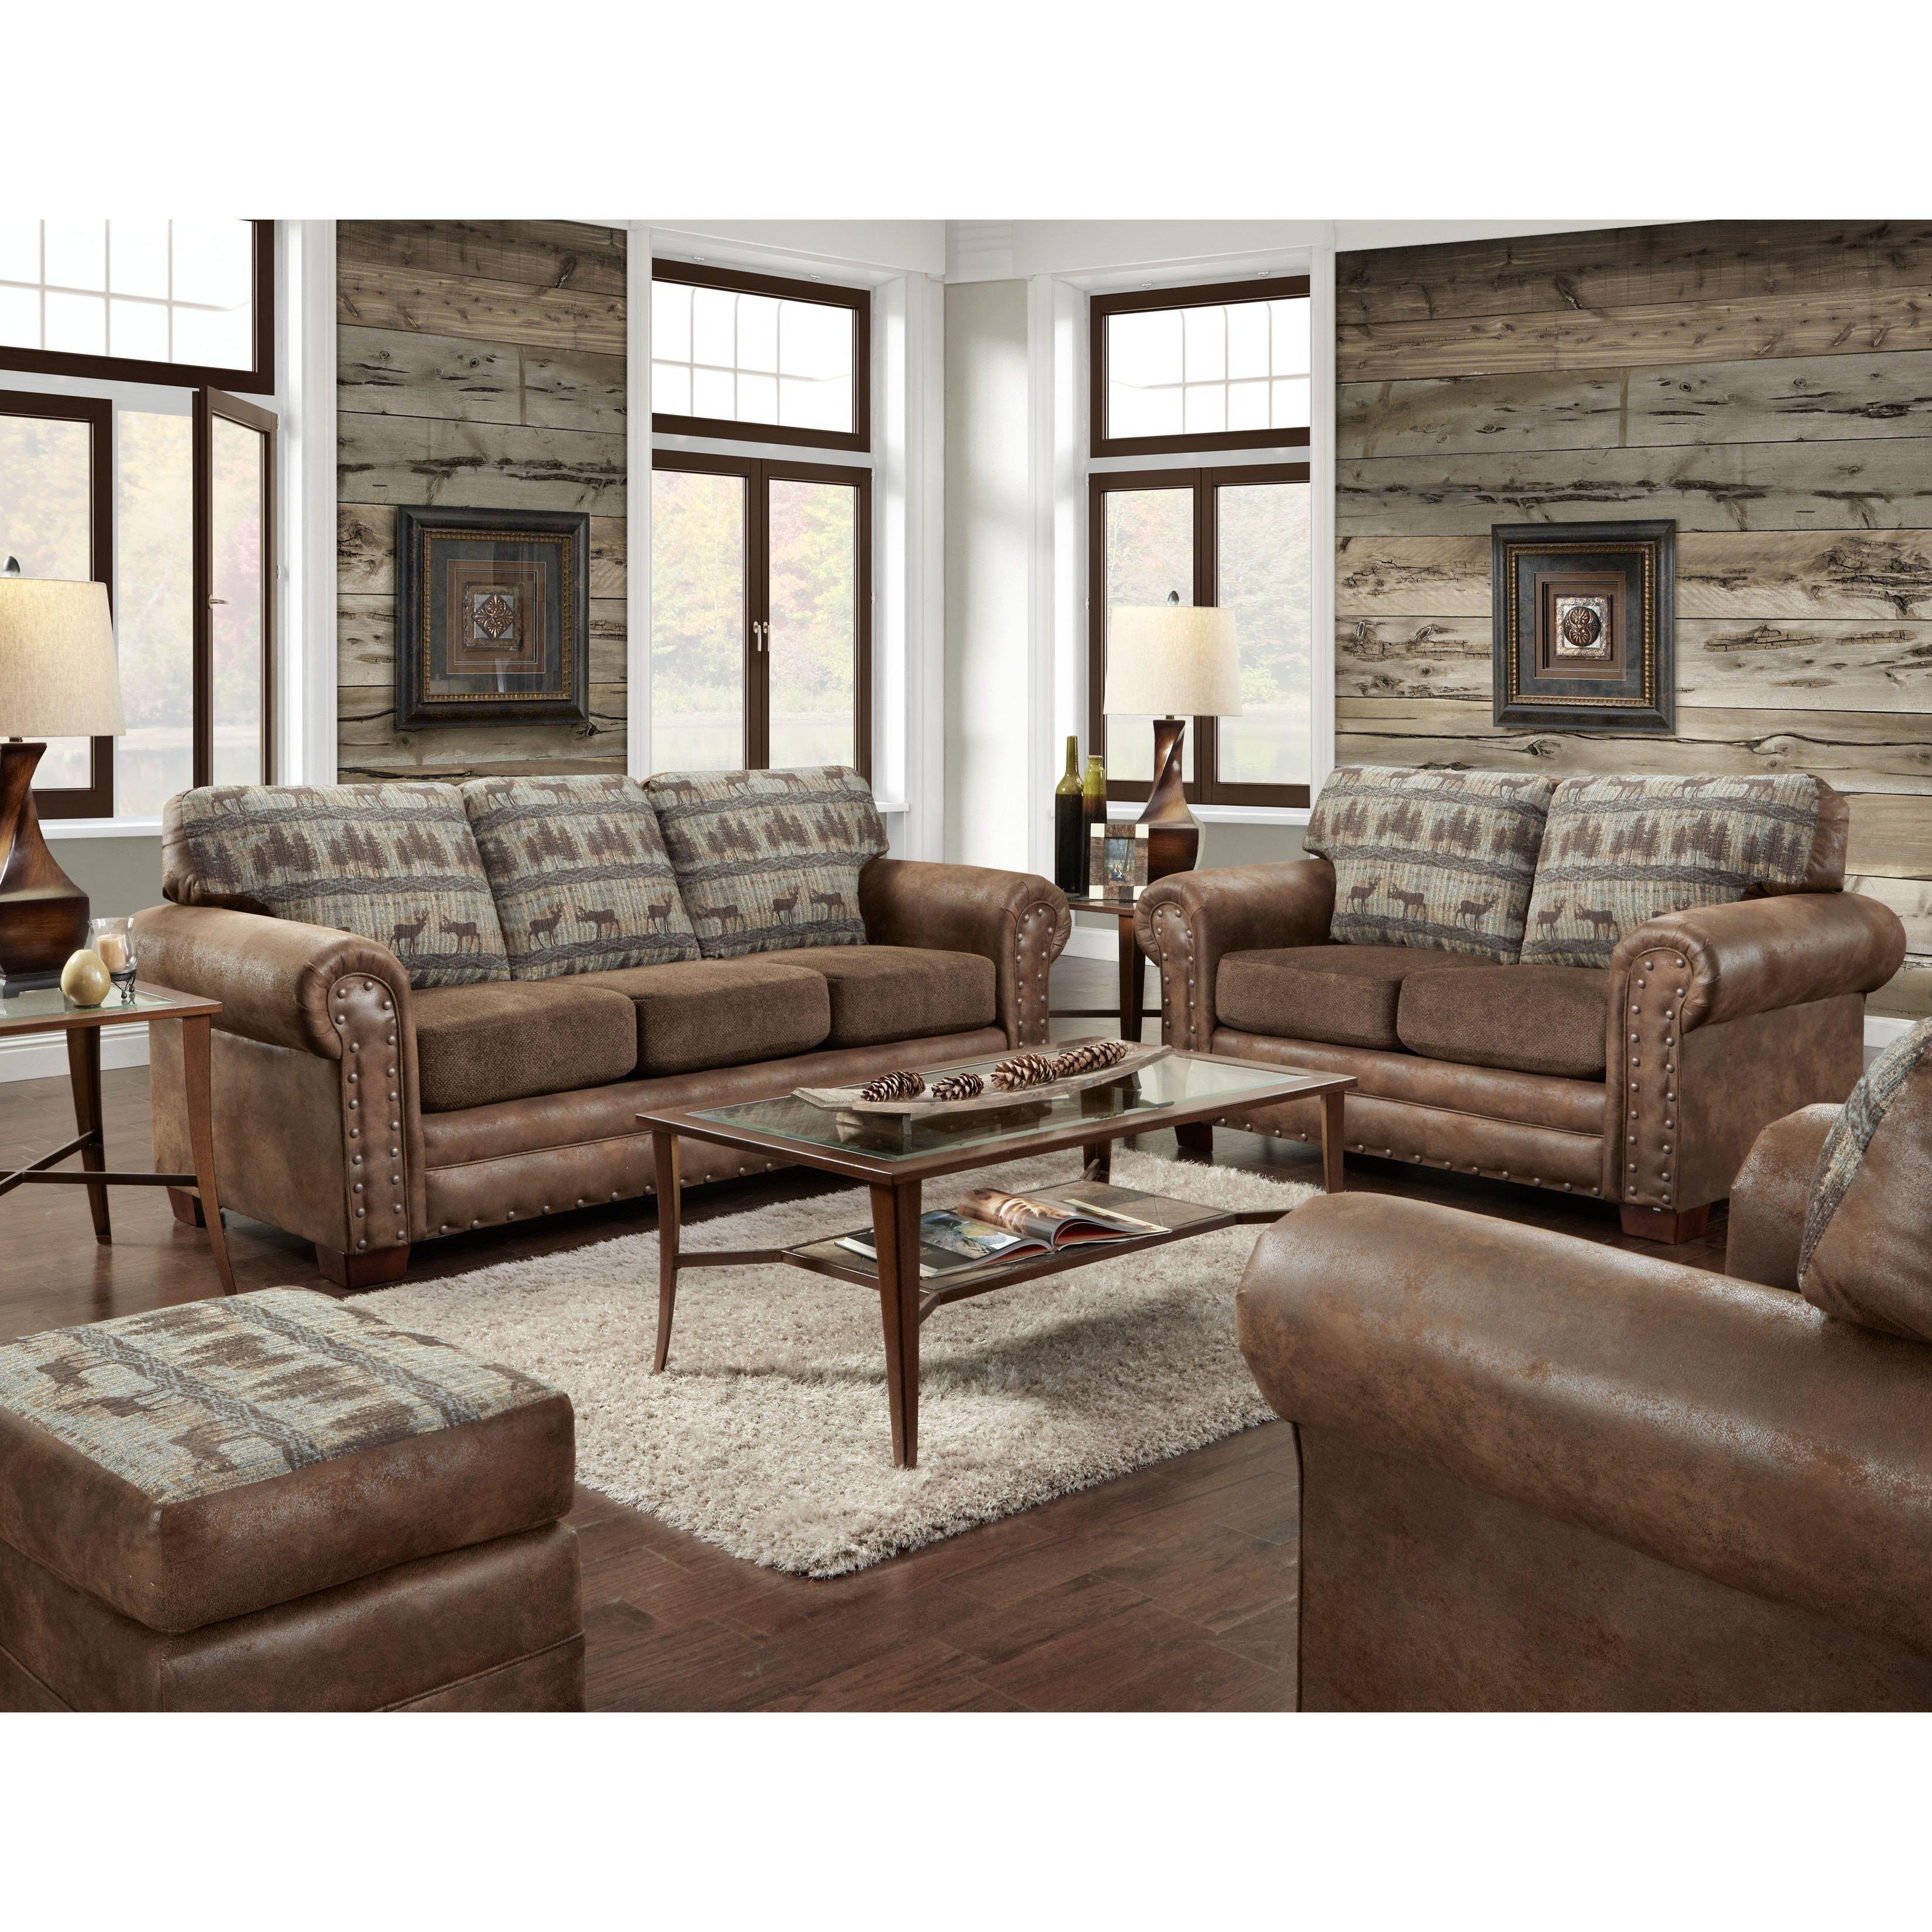 dp seat utbtl furniture american kitchen com amazon dining lodge classics sierra love